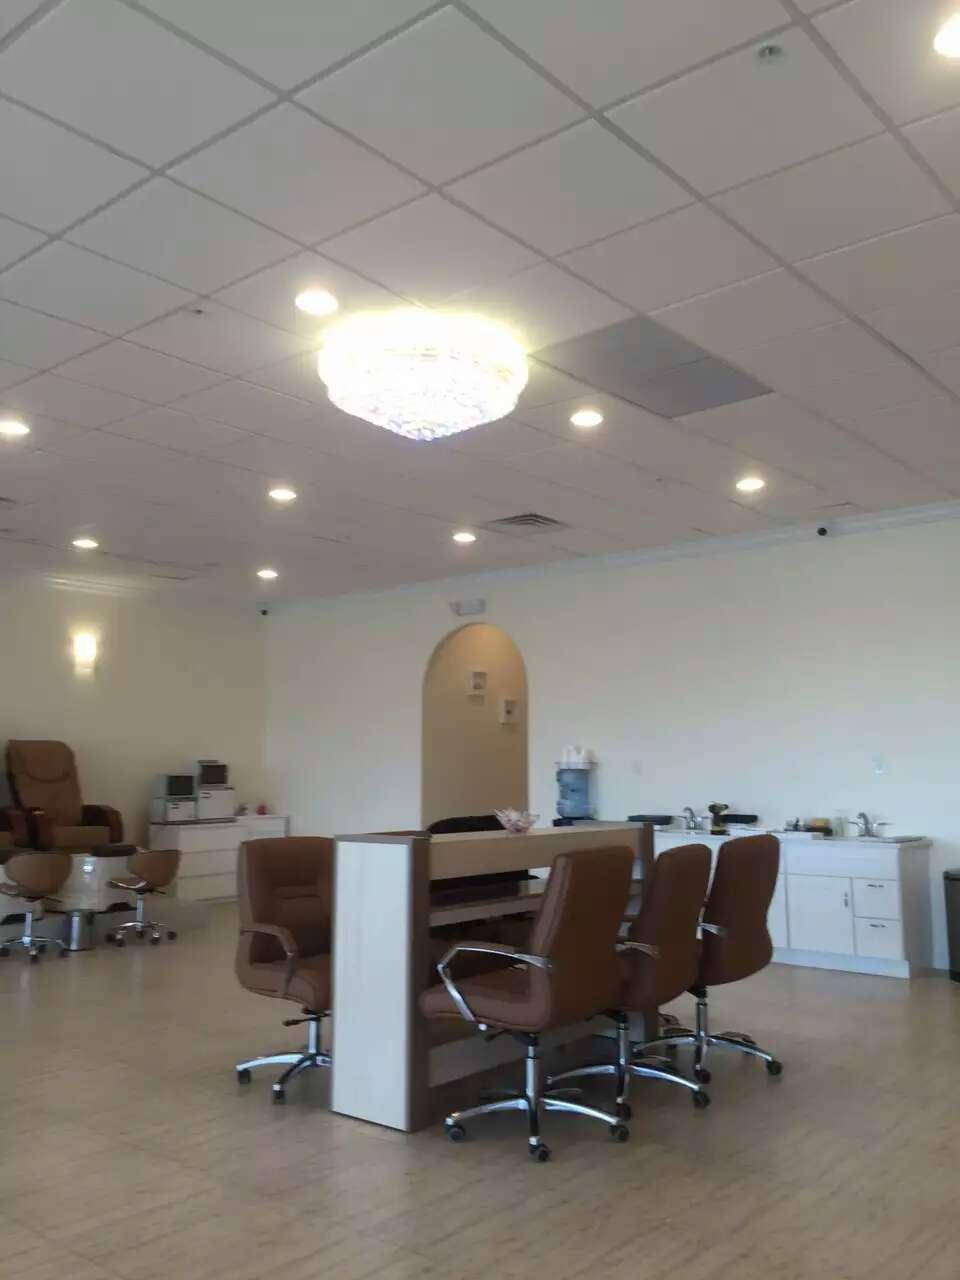 Royal Beauty Nails and Spa - hair care    Photo 4 of 9   Address: 1911, 461 US-46, Fairfield, NJ 07004, USA   Phone: (973) 227-1113